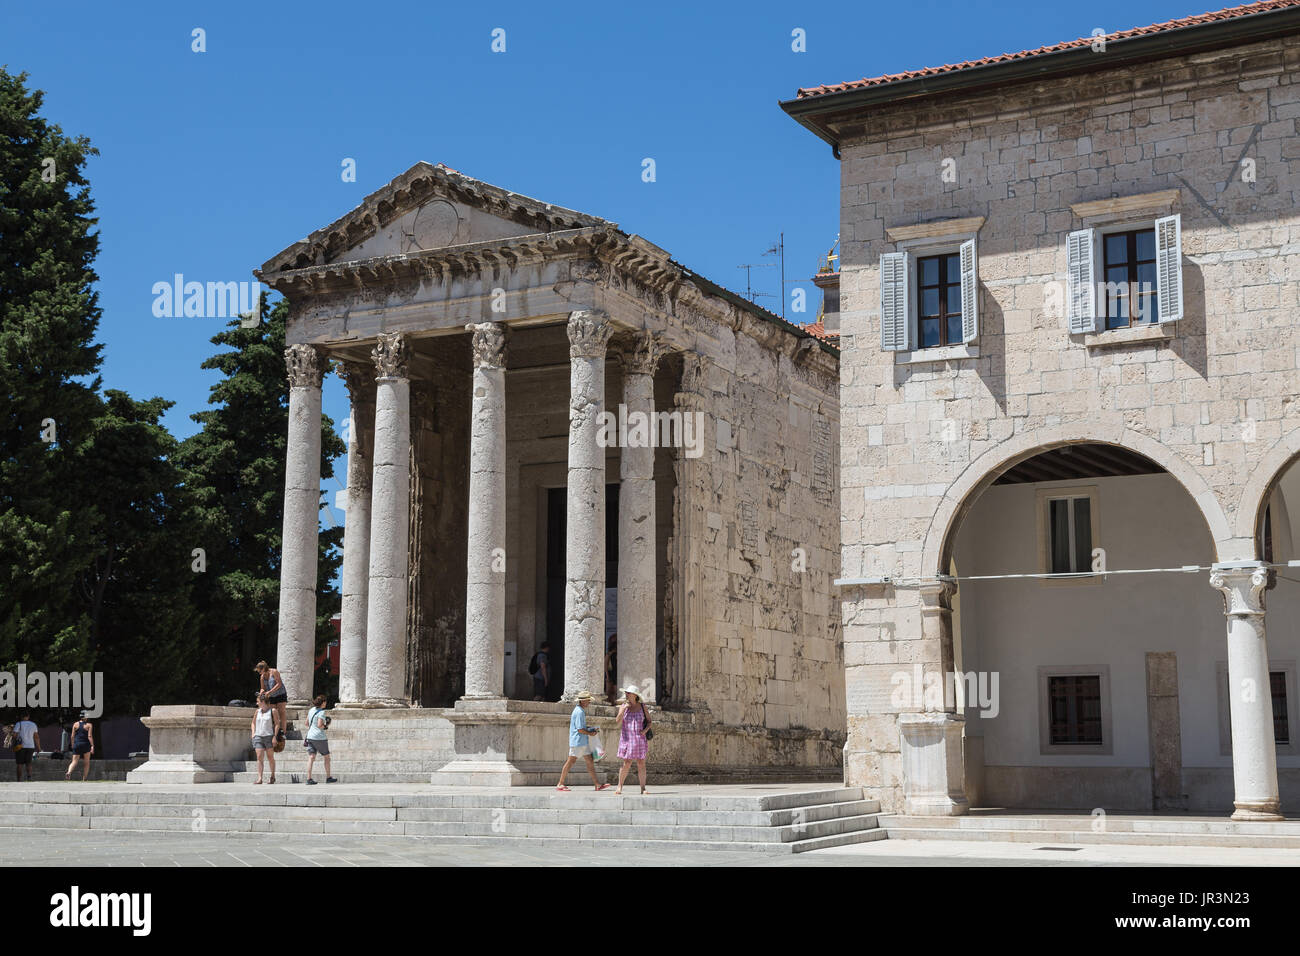 Pula Croatia.Temple of Romae & Augustus. - Stock Image